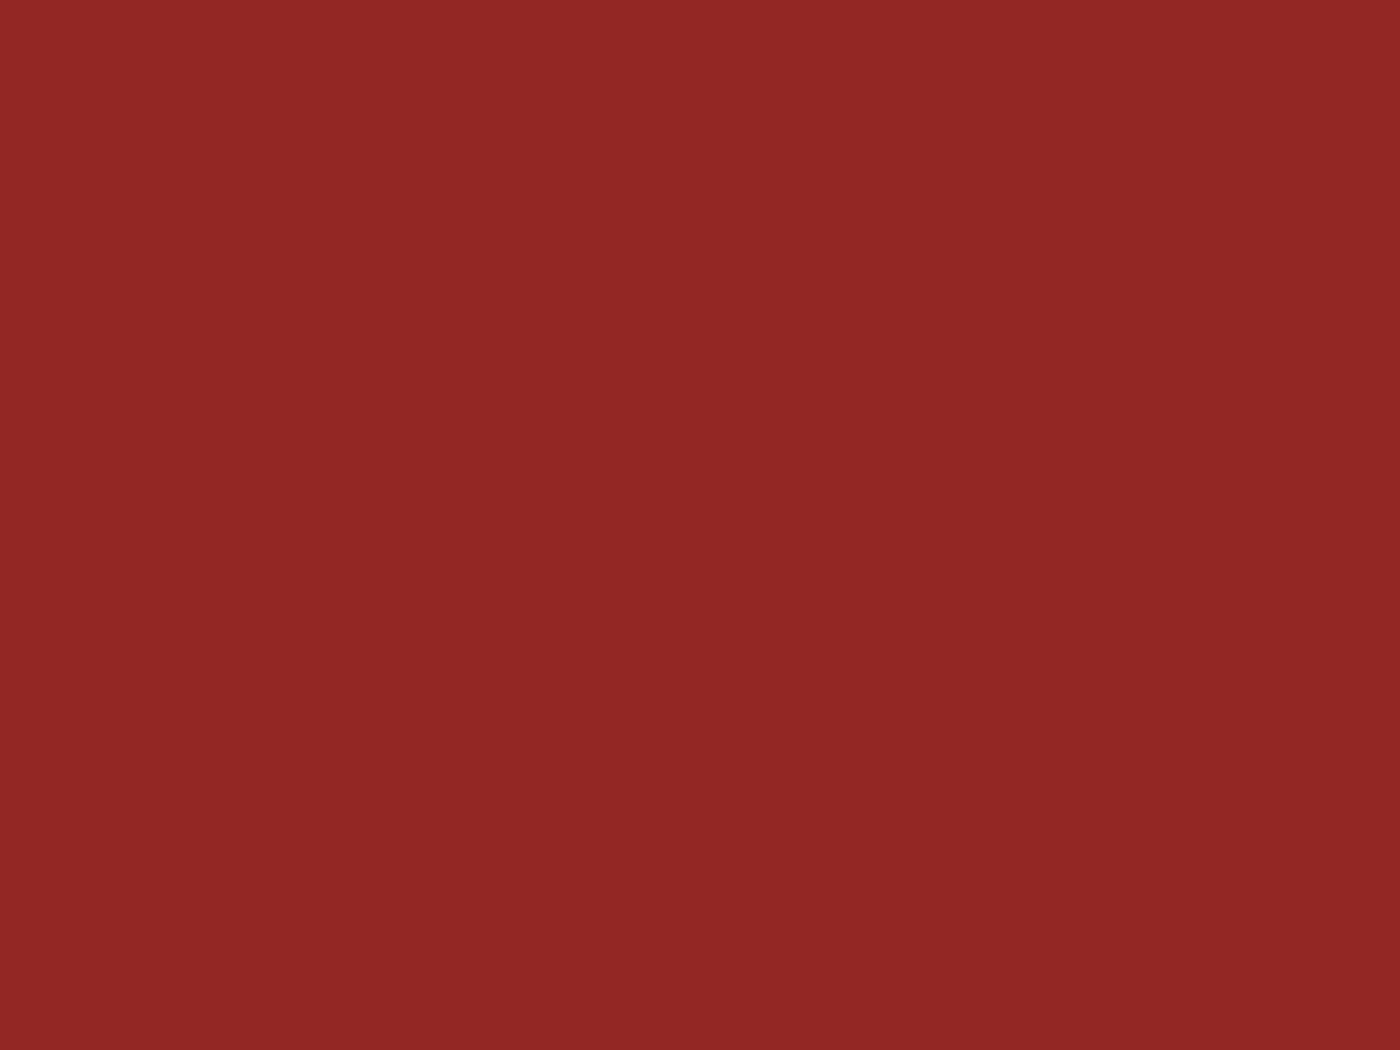 1400x1050 Vivid Auburn Solid Color Background